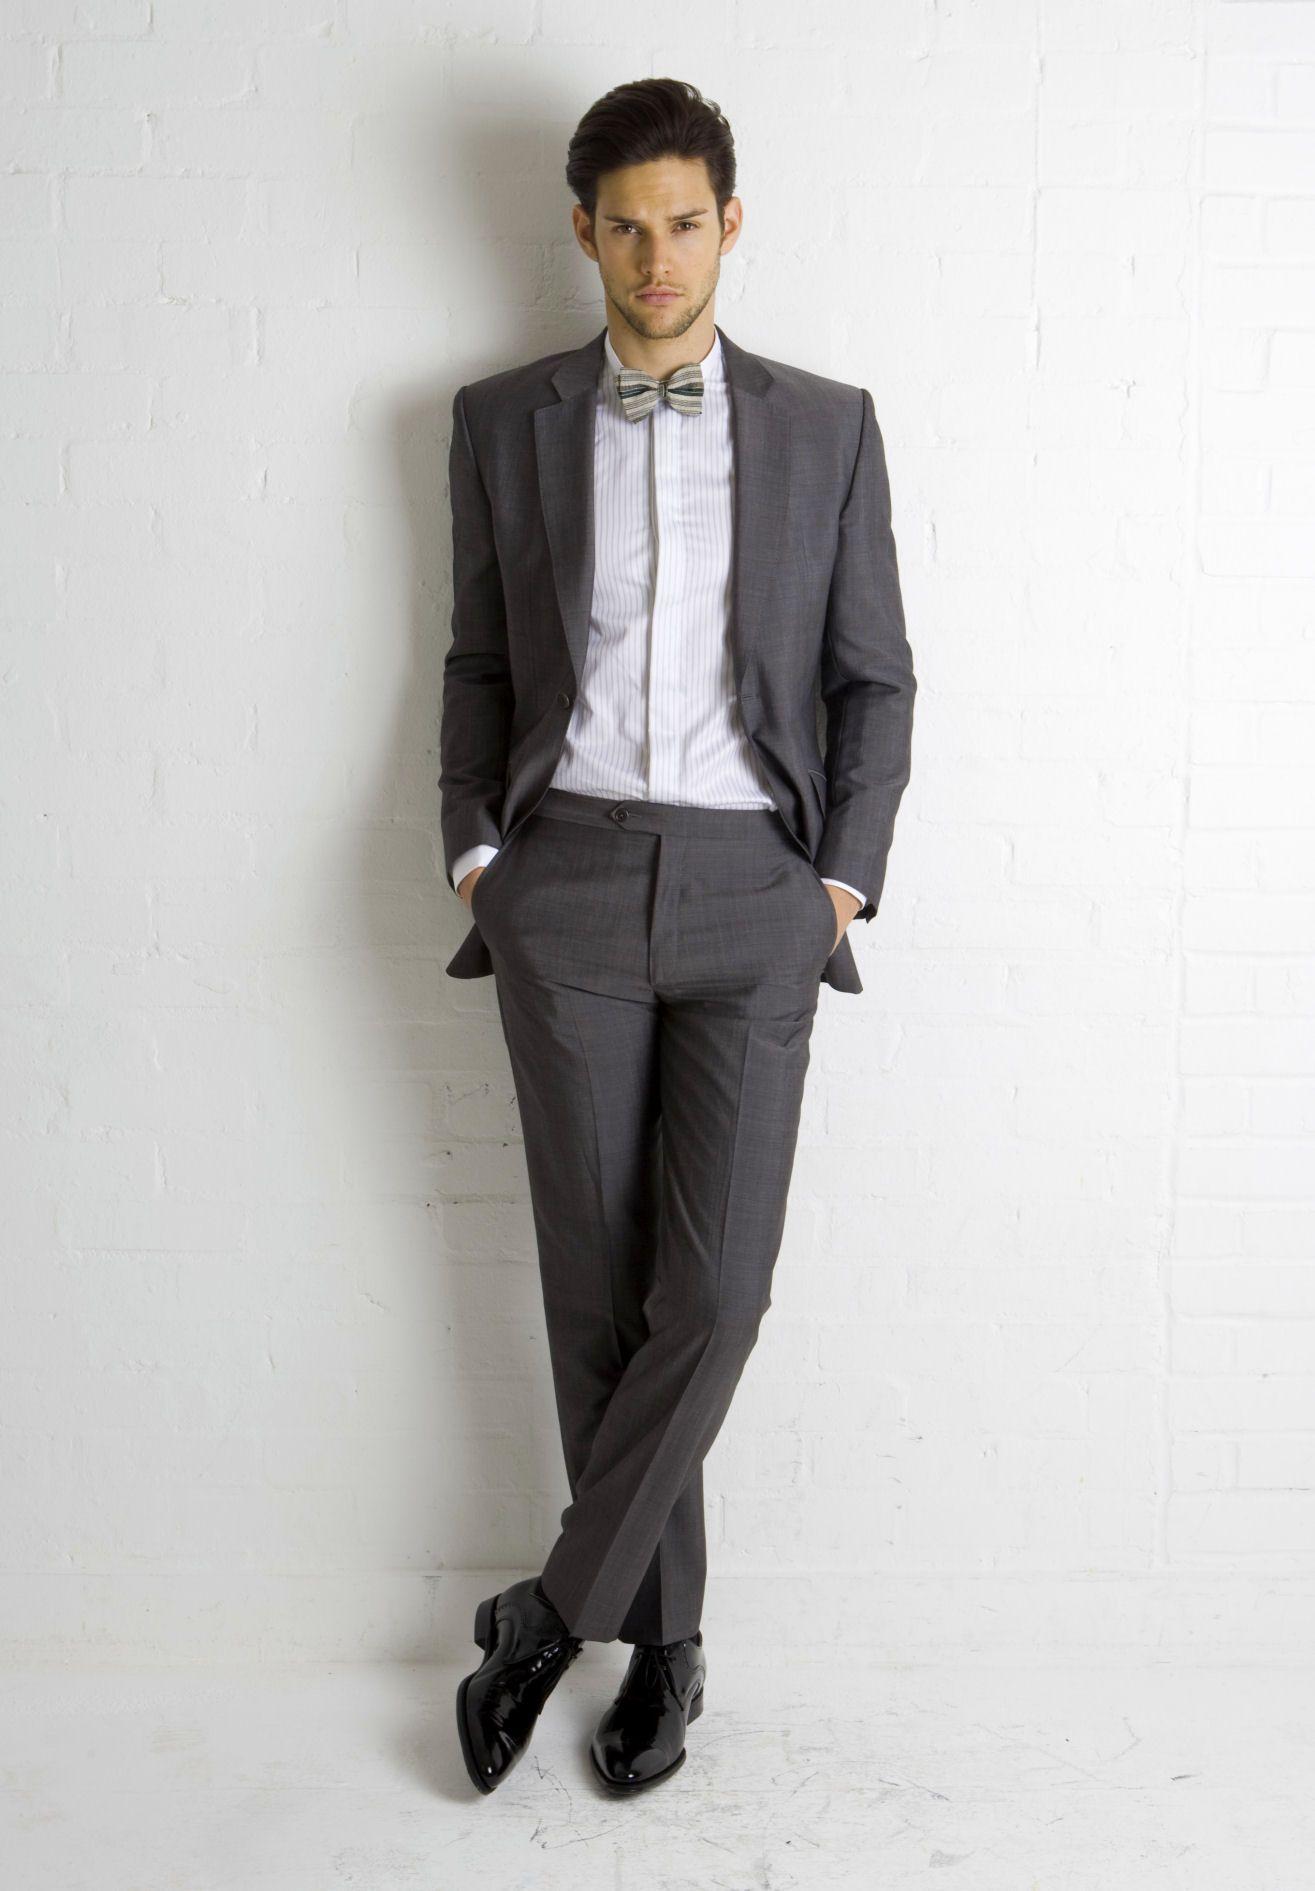 Dapper · suit and tie for men | Grey Mohair ...